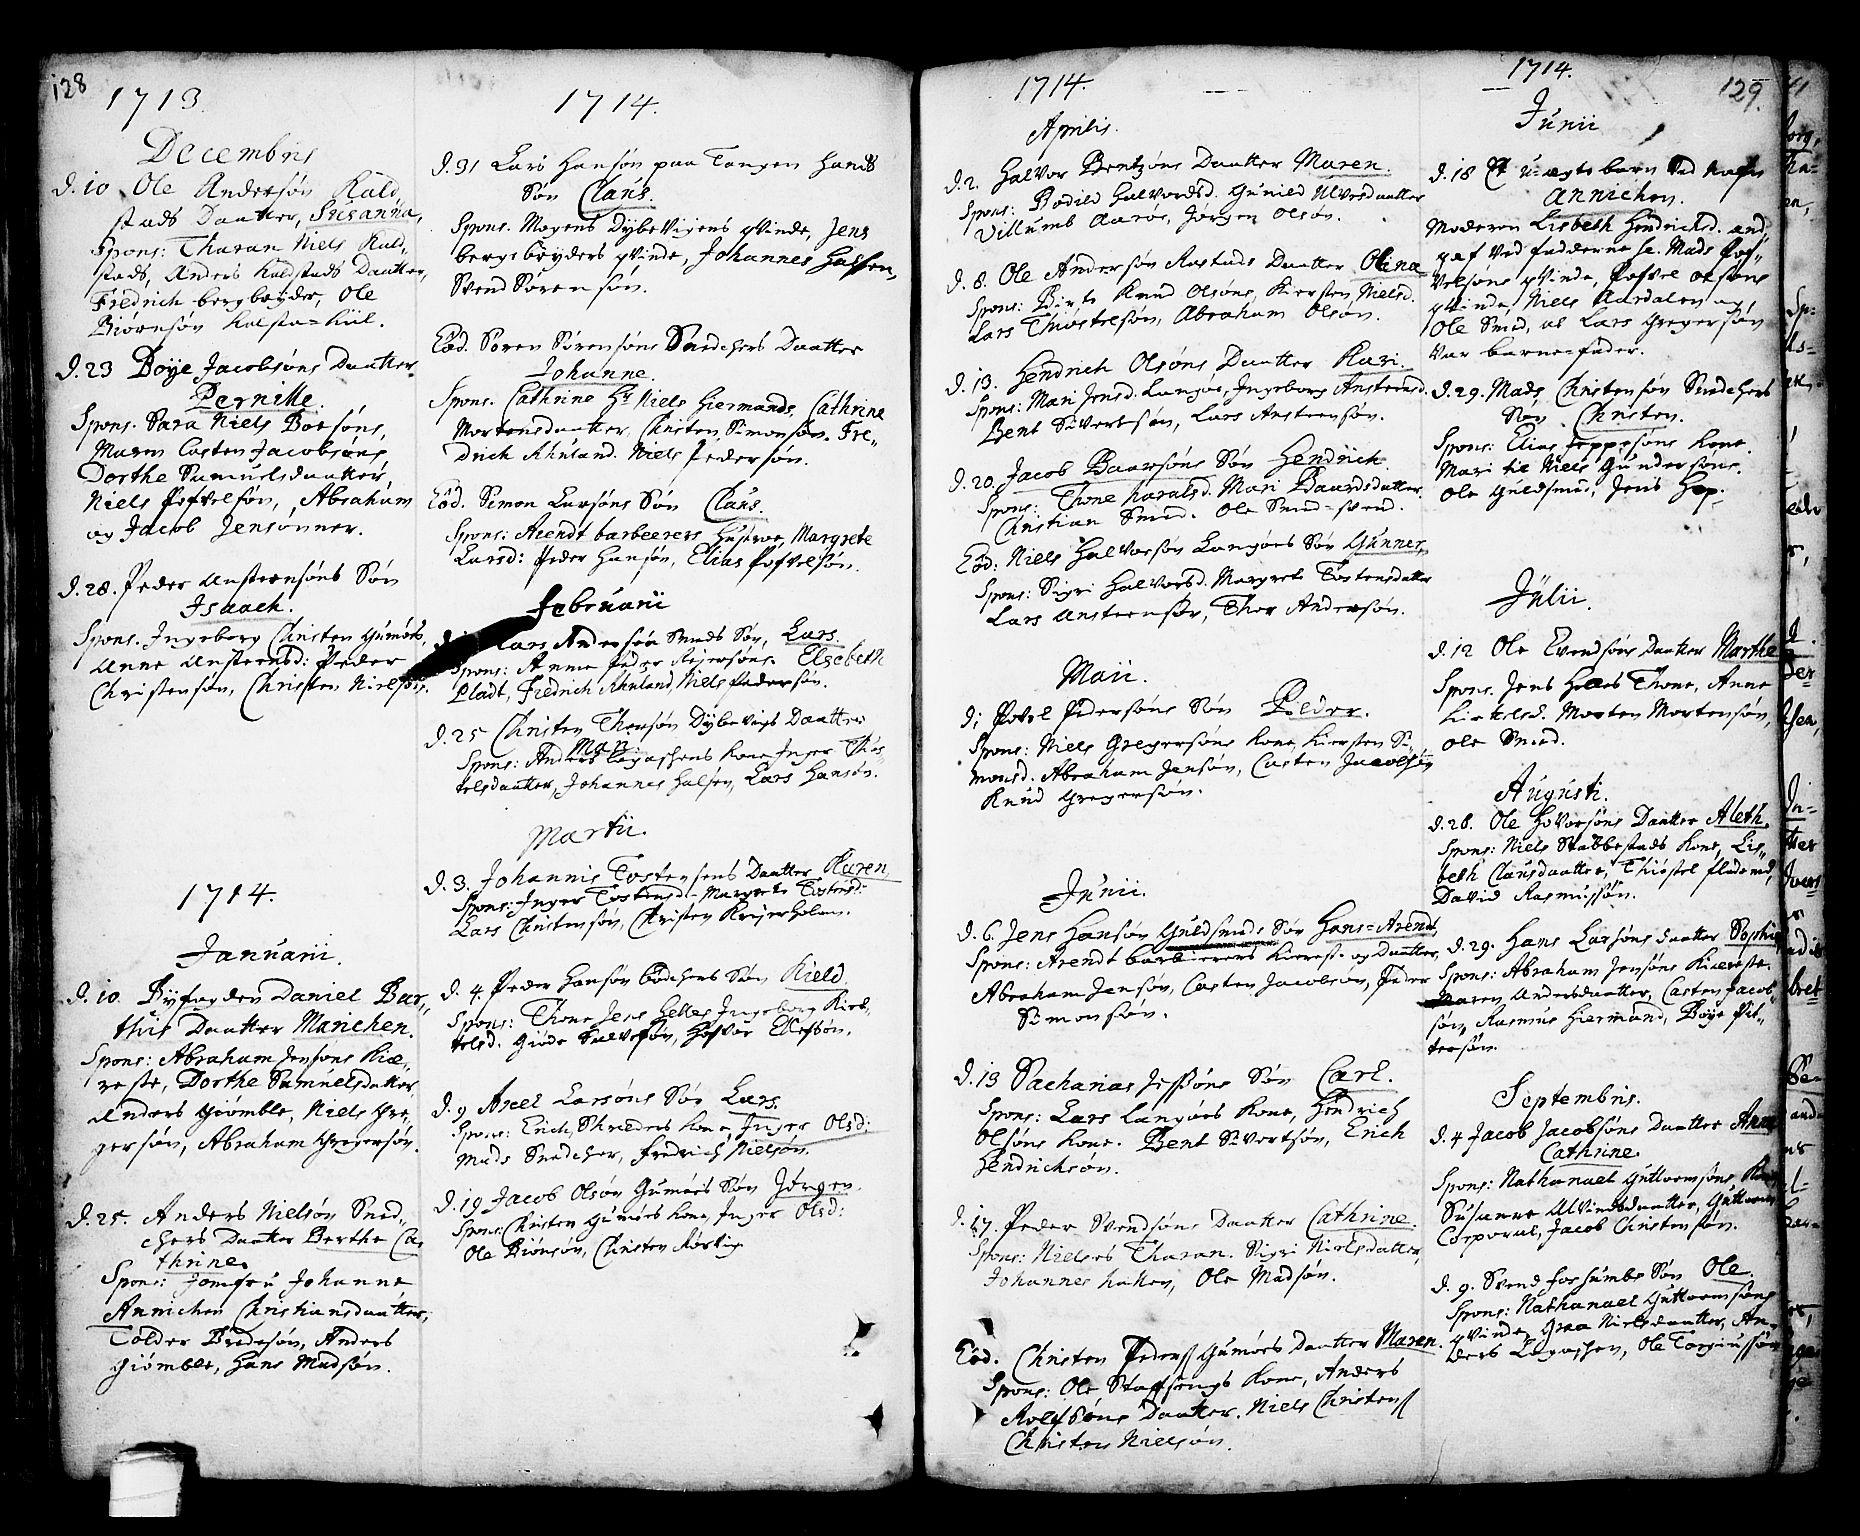 SAKO, Kragerø kirkebøker, F/Fa/L0001: Ministerialbok nr. 1, 1702-1766, s. 128-129